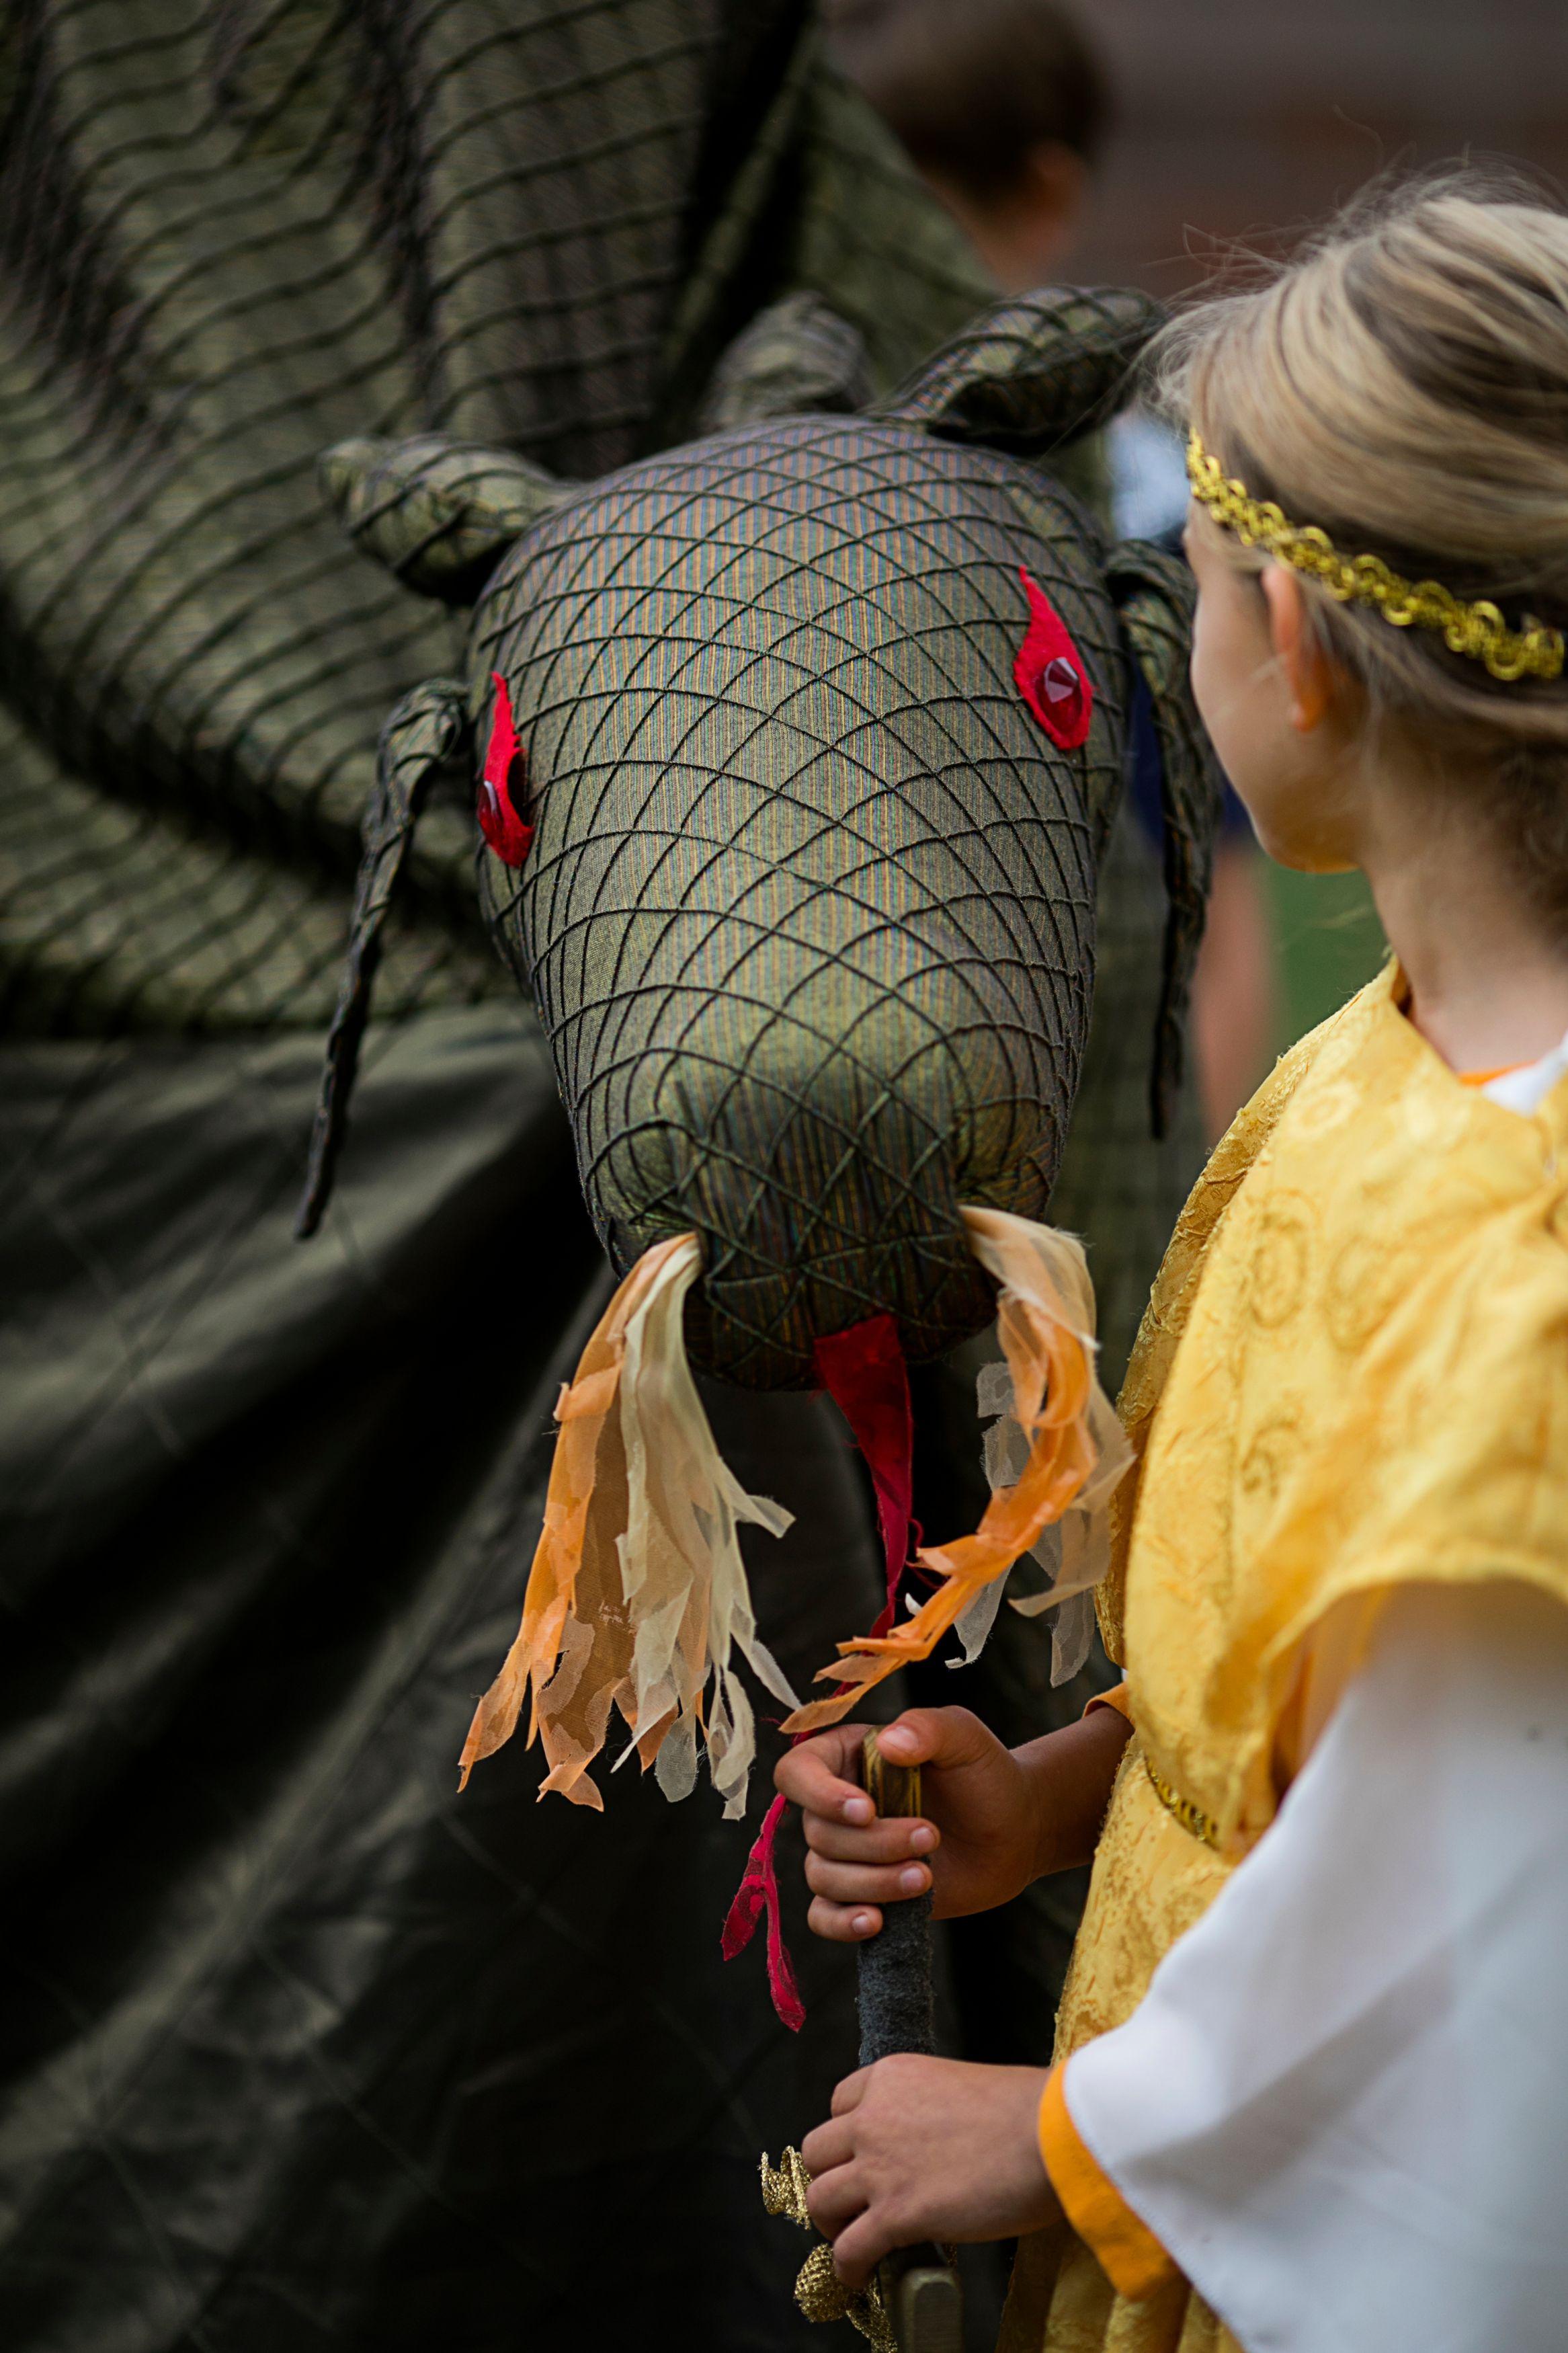 Girl with Michaelmas Dragon